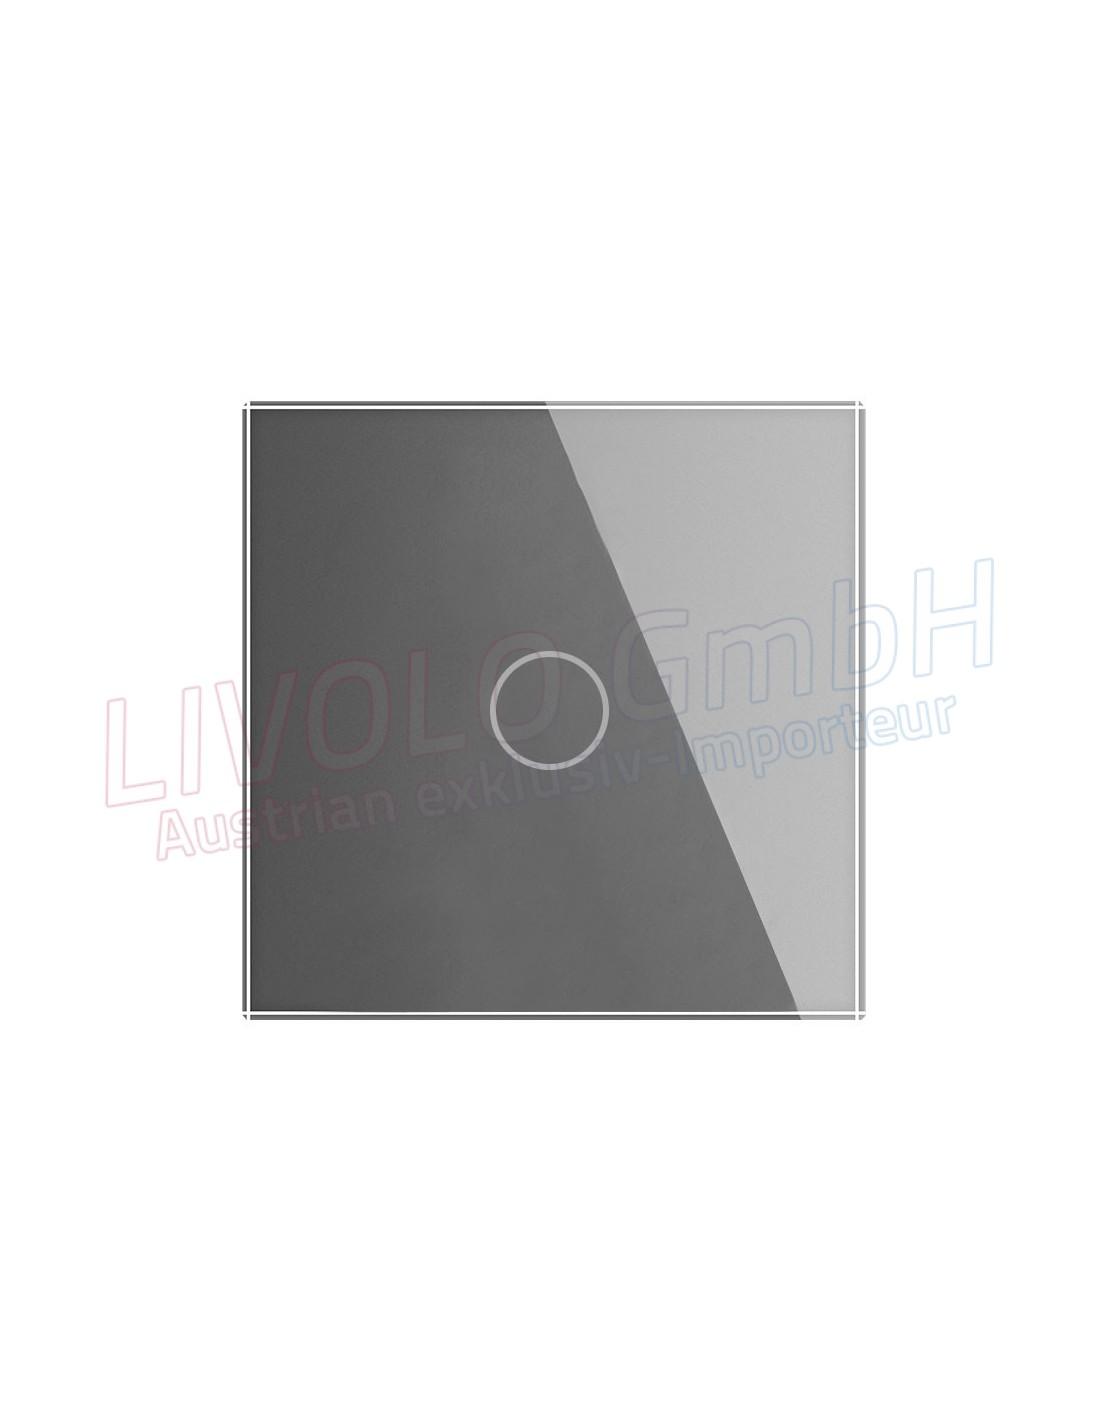 Livolo Glass Rahmen für Livolo Schalter